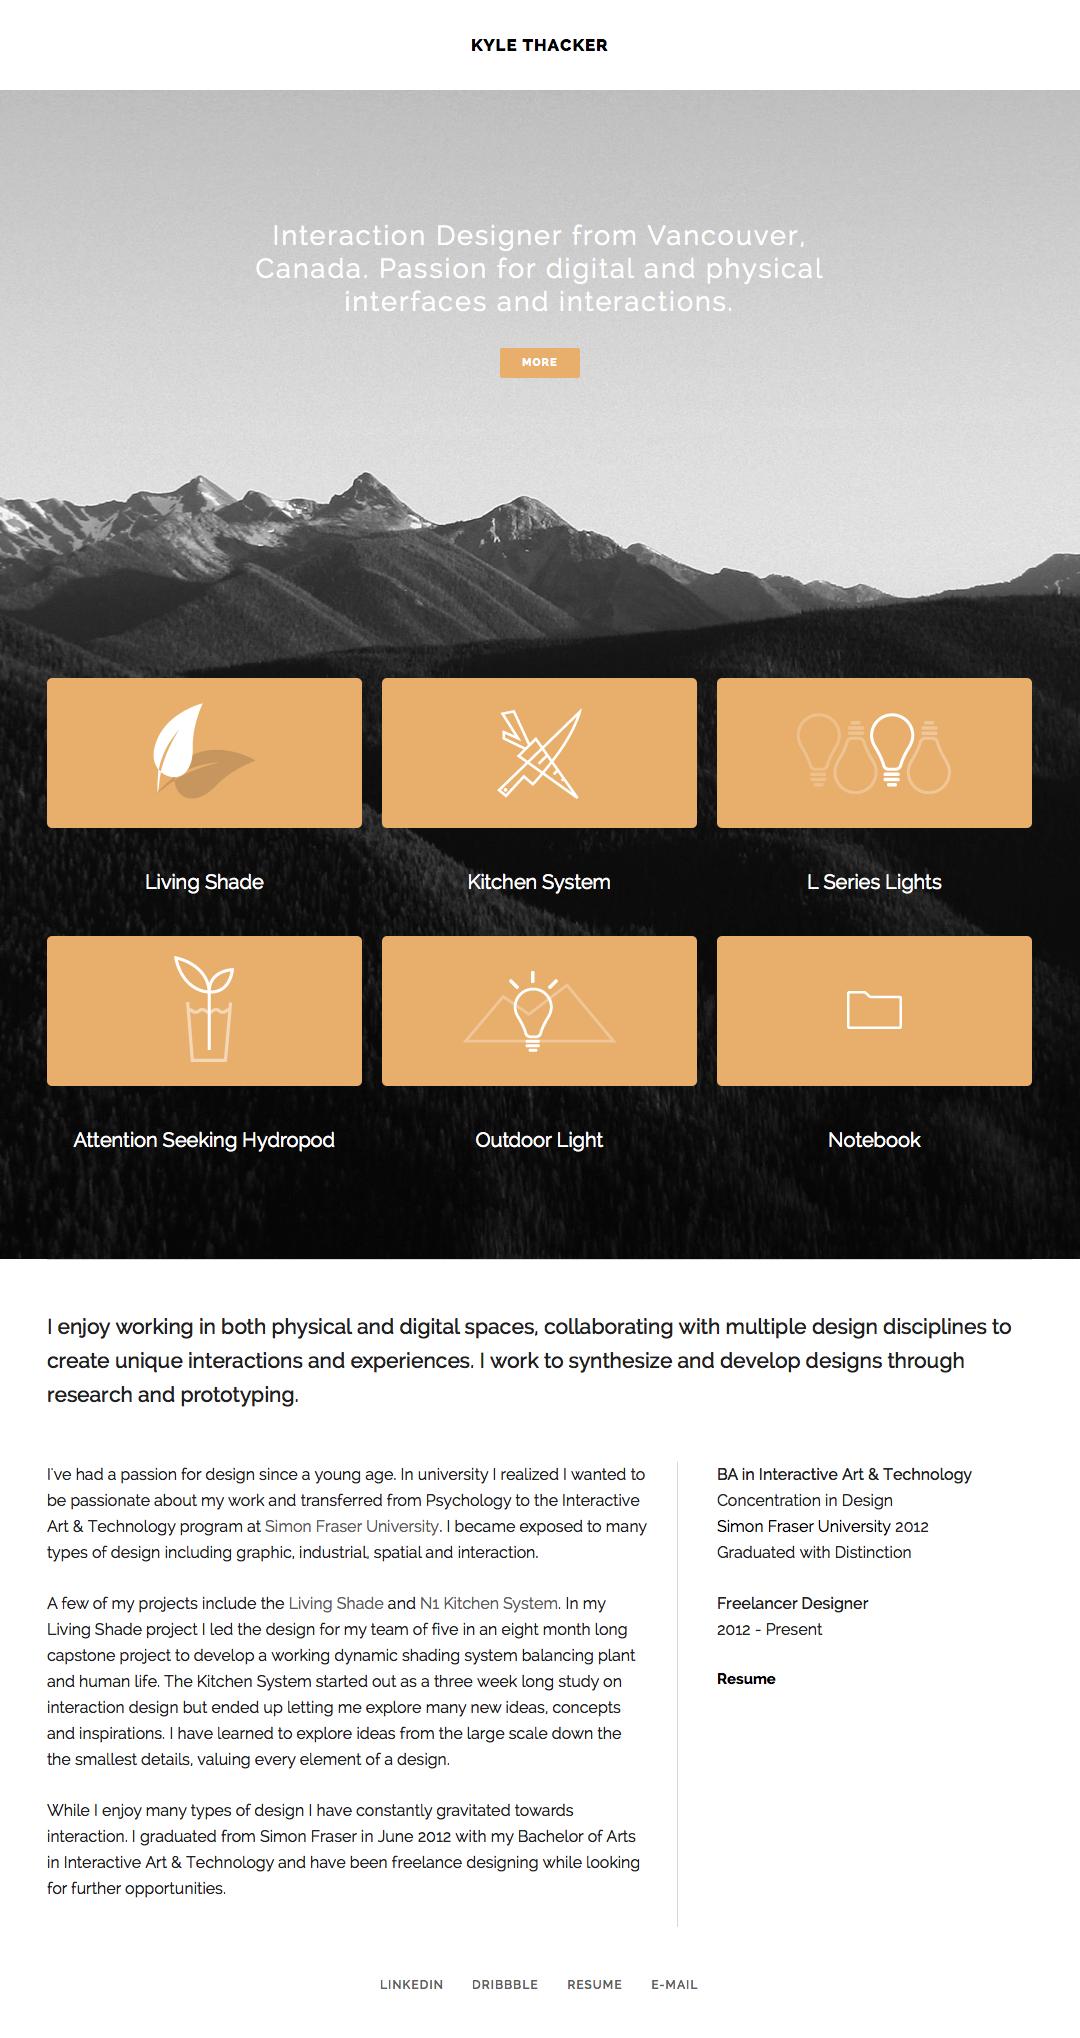 Kyle Thacker #webdesign #inspiration